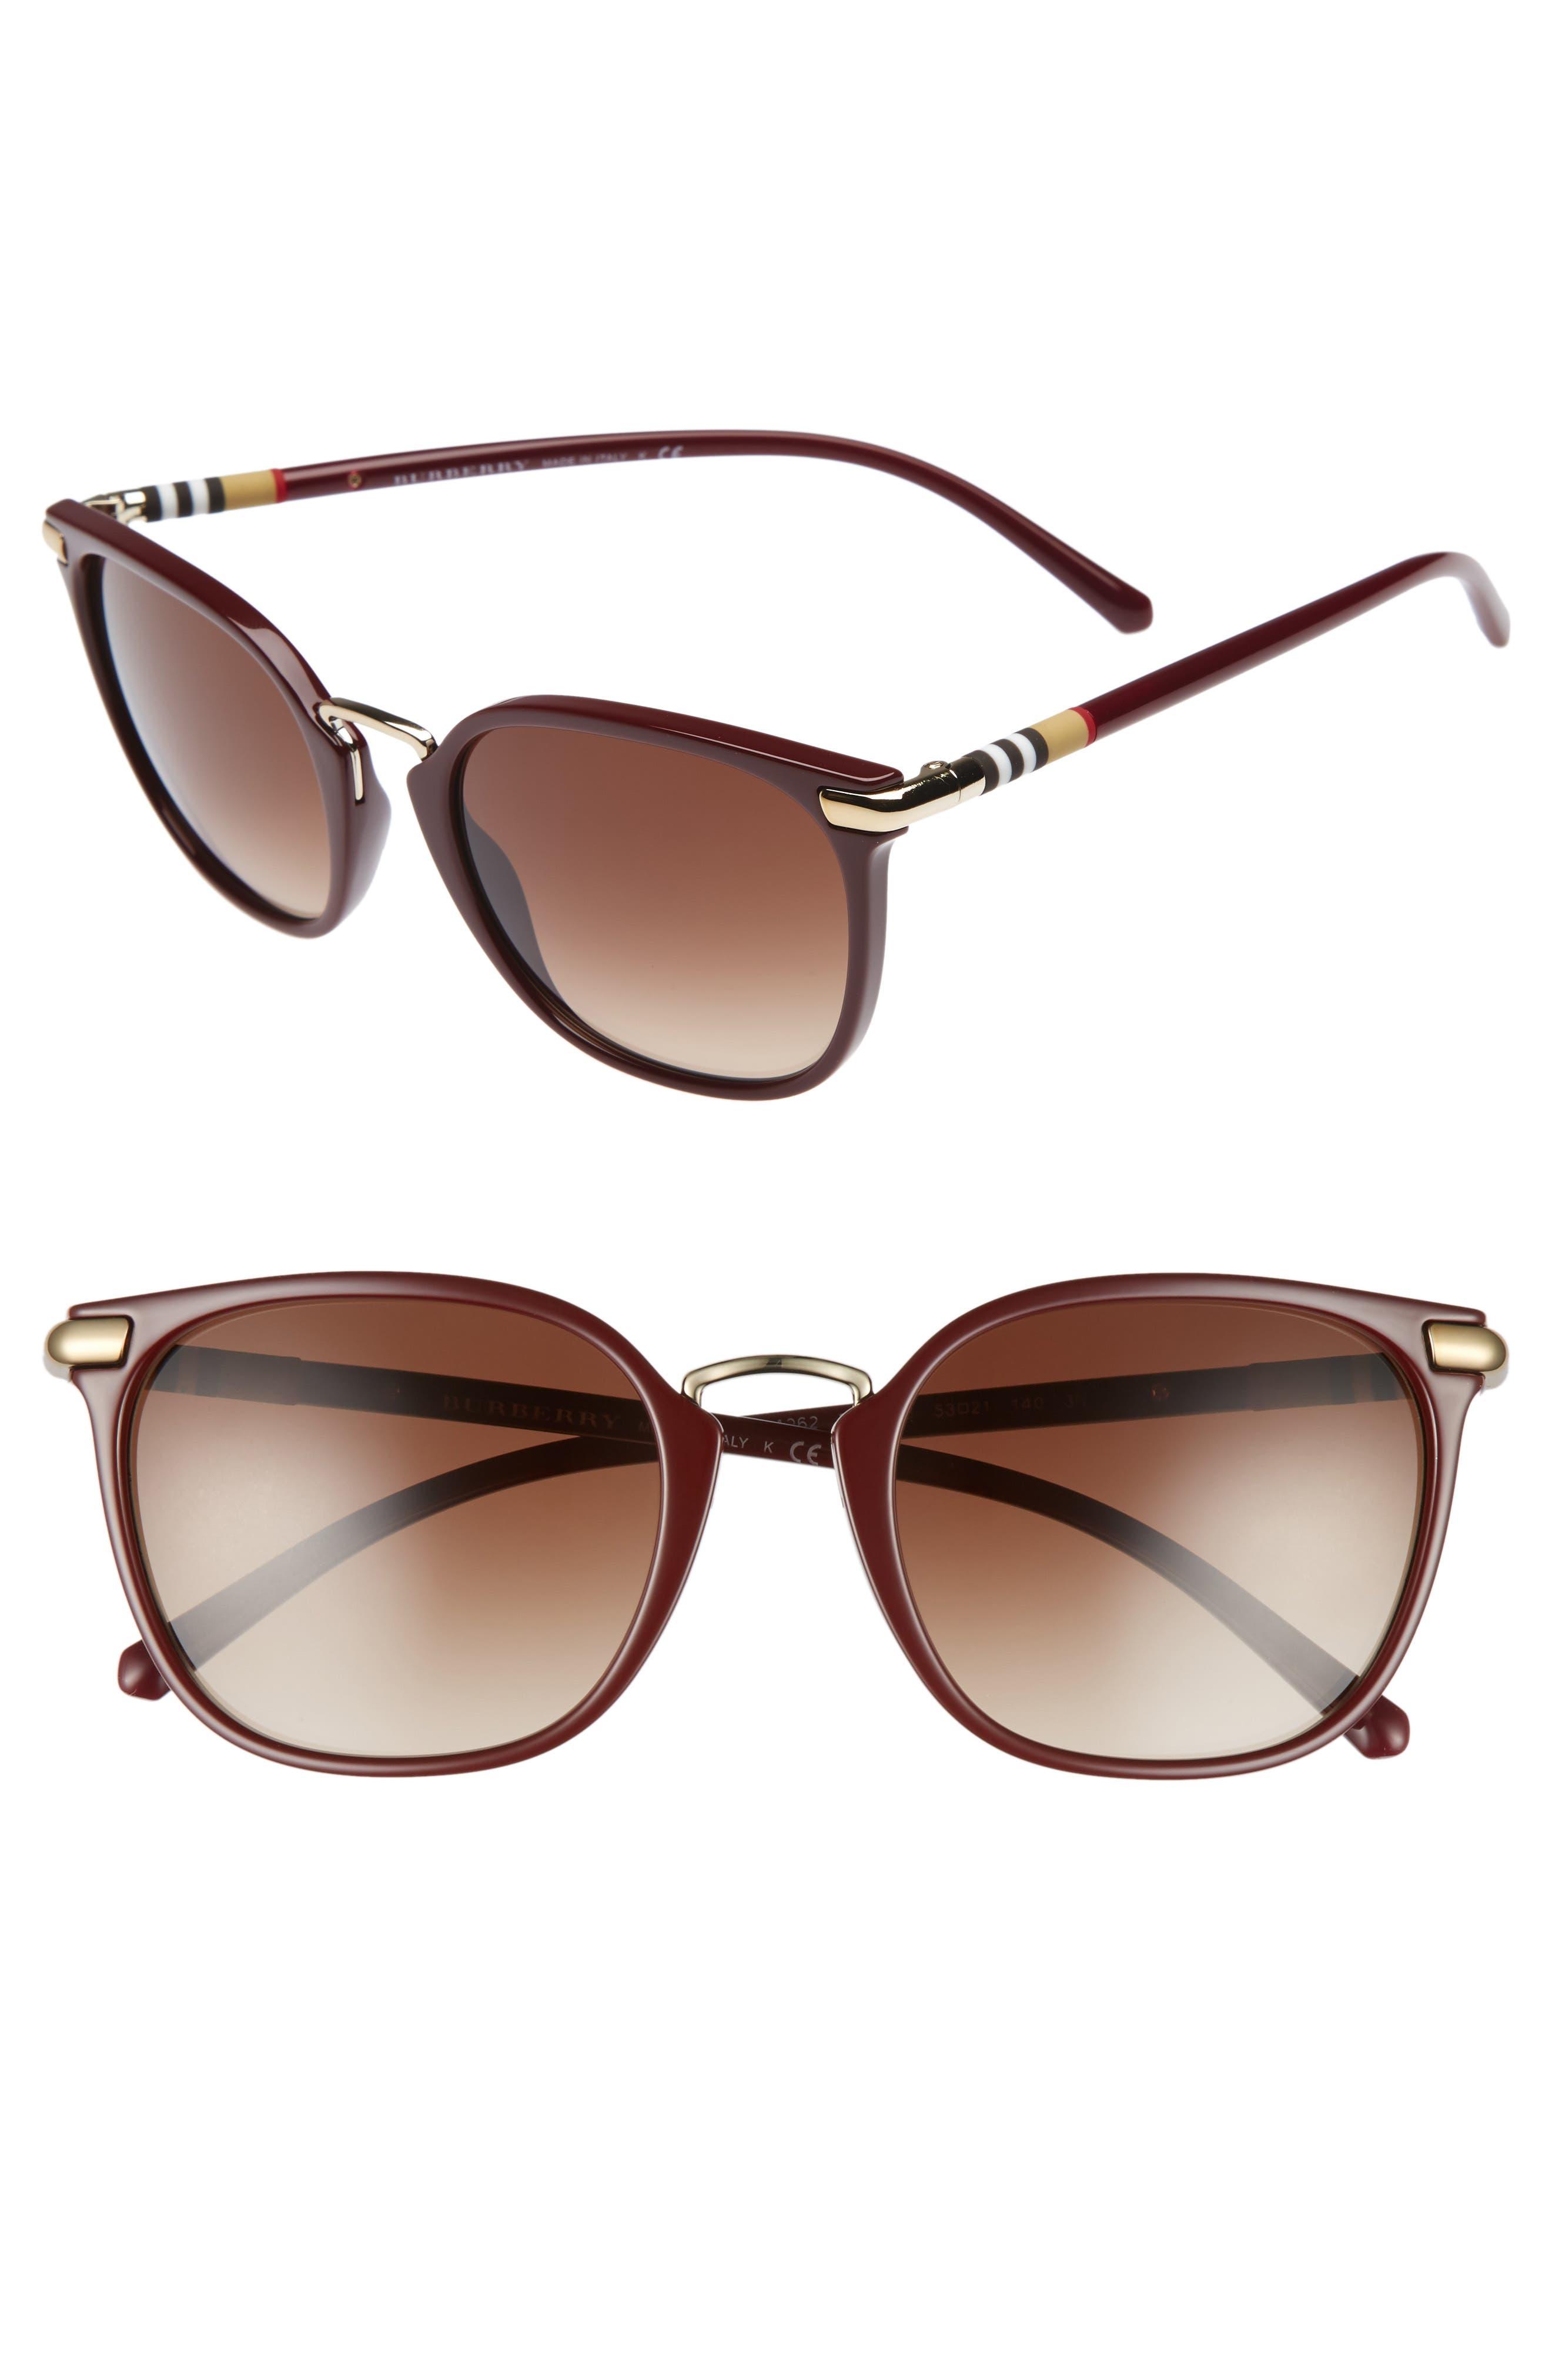 Alternate Image 1 Selected - Burberry 53mm Gradient Square Sunglasses